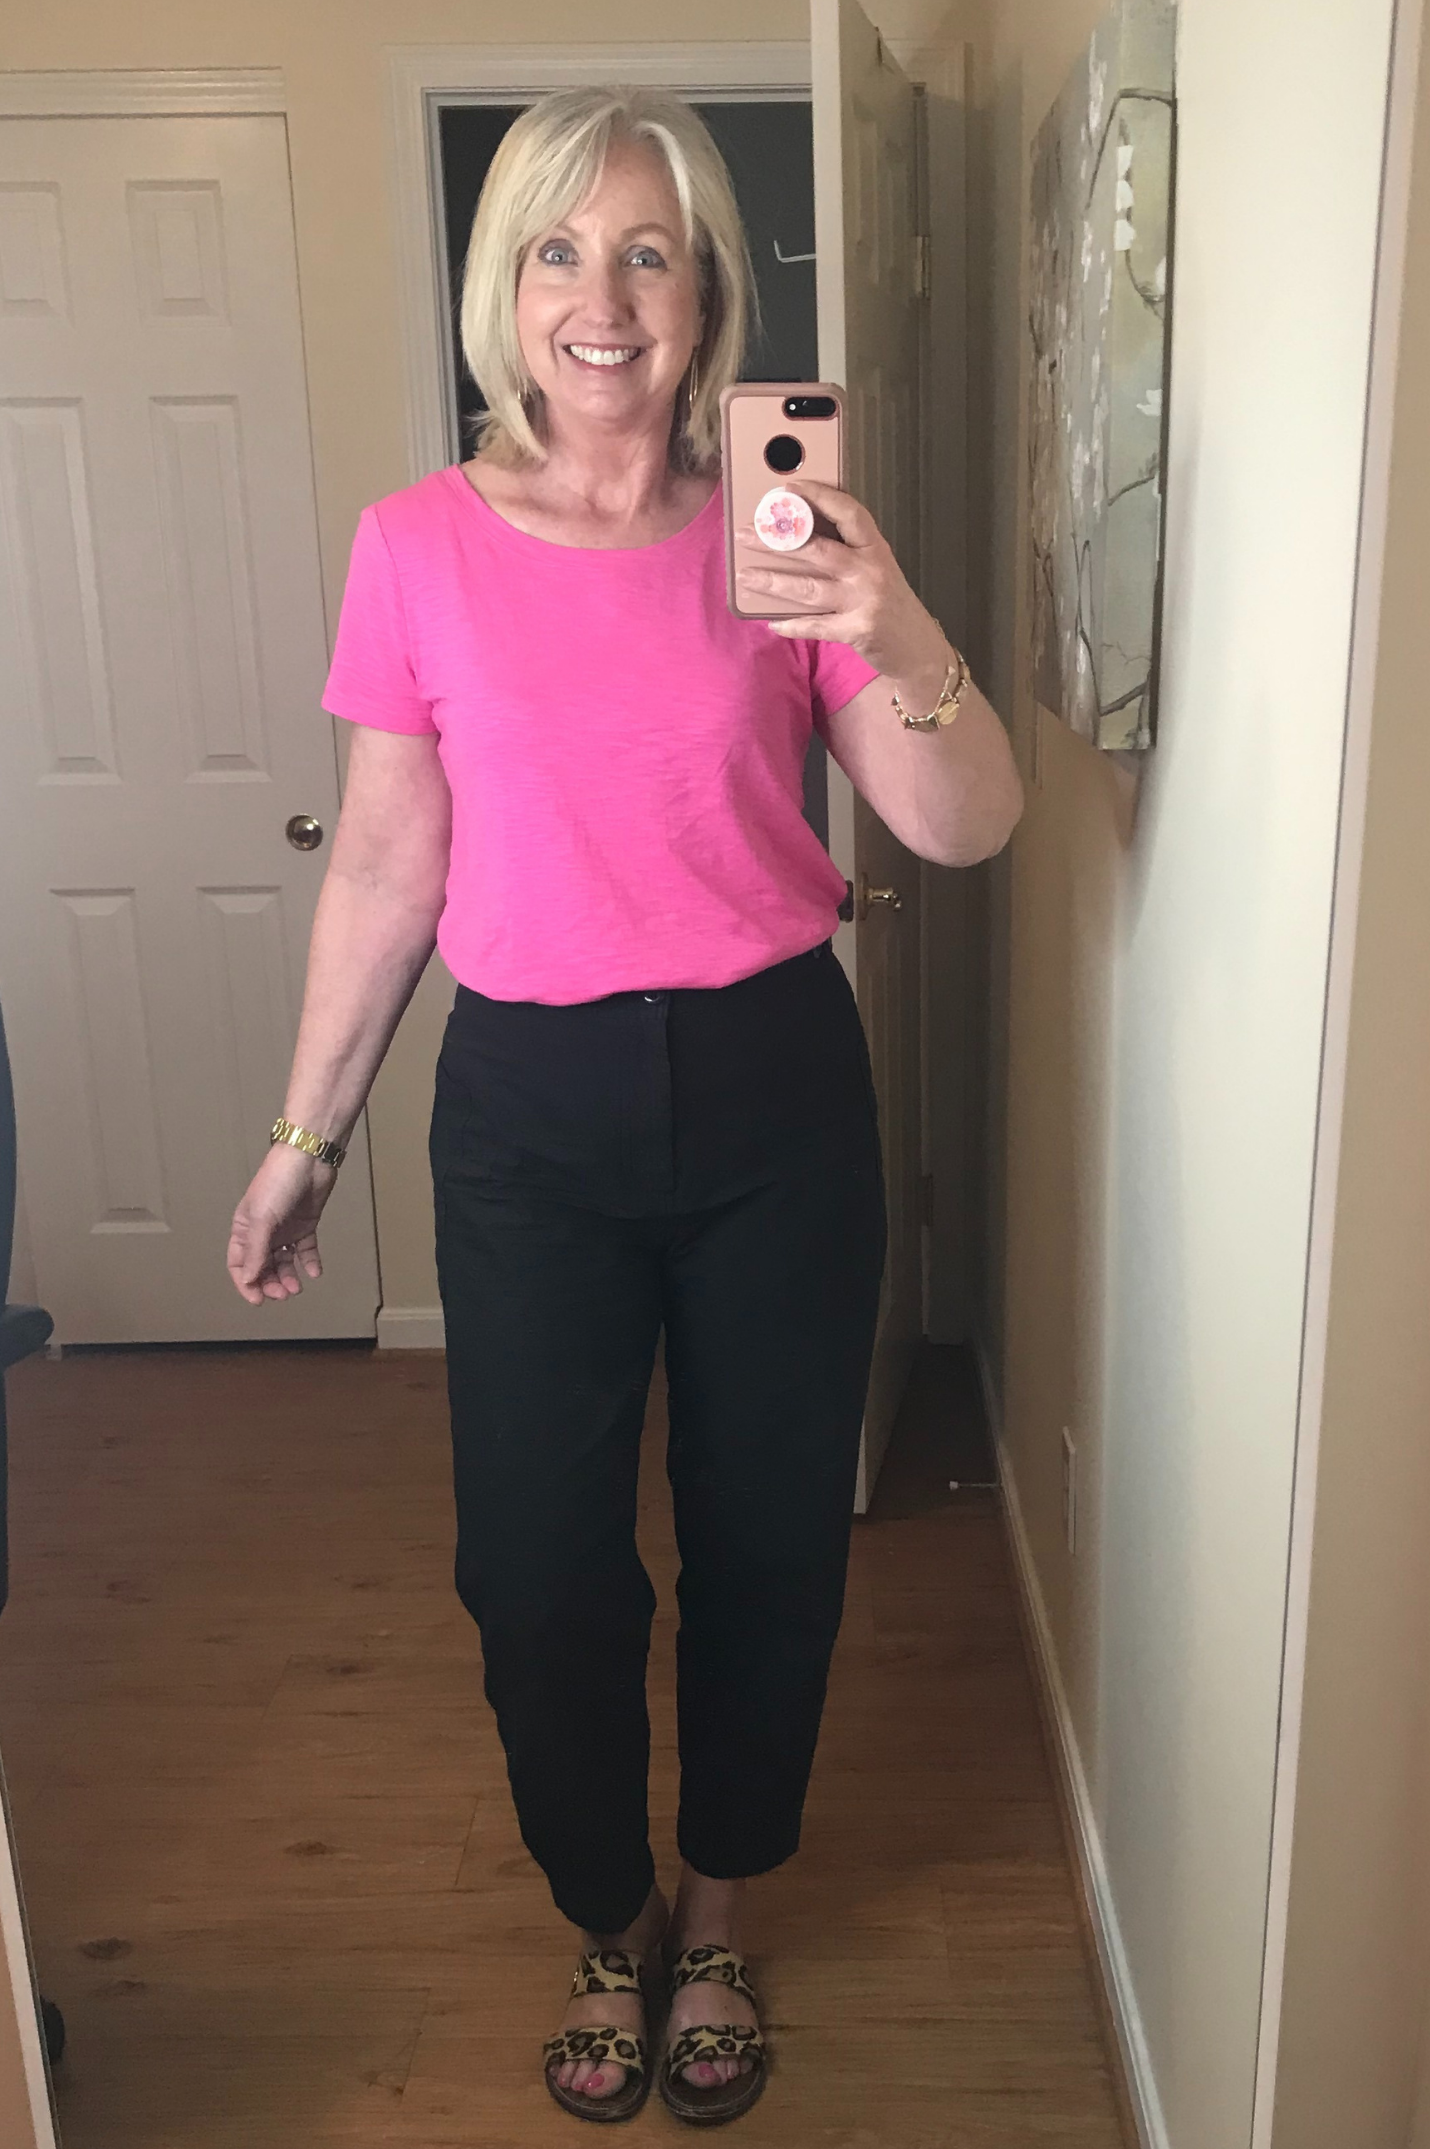 How I Dressed for Wednesday